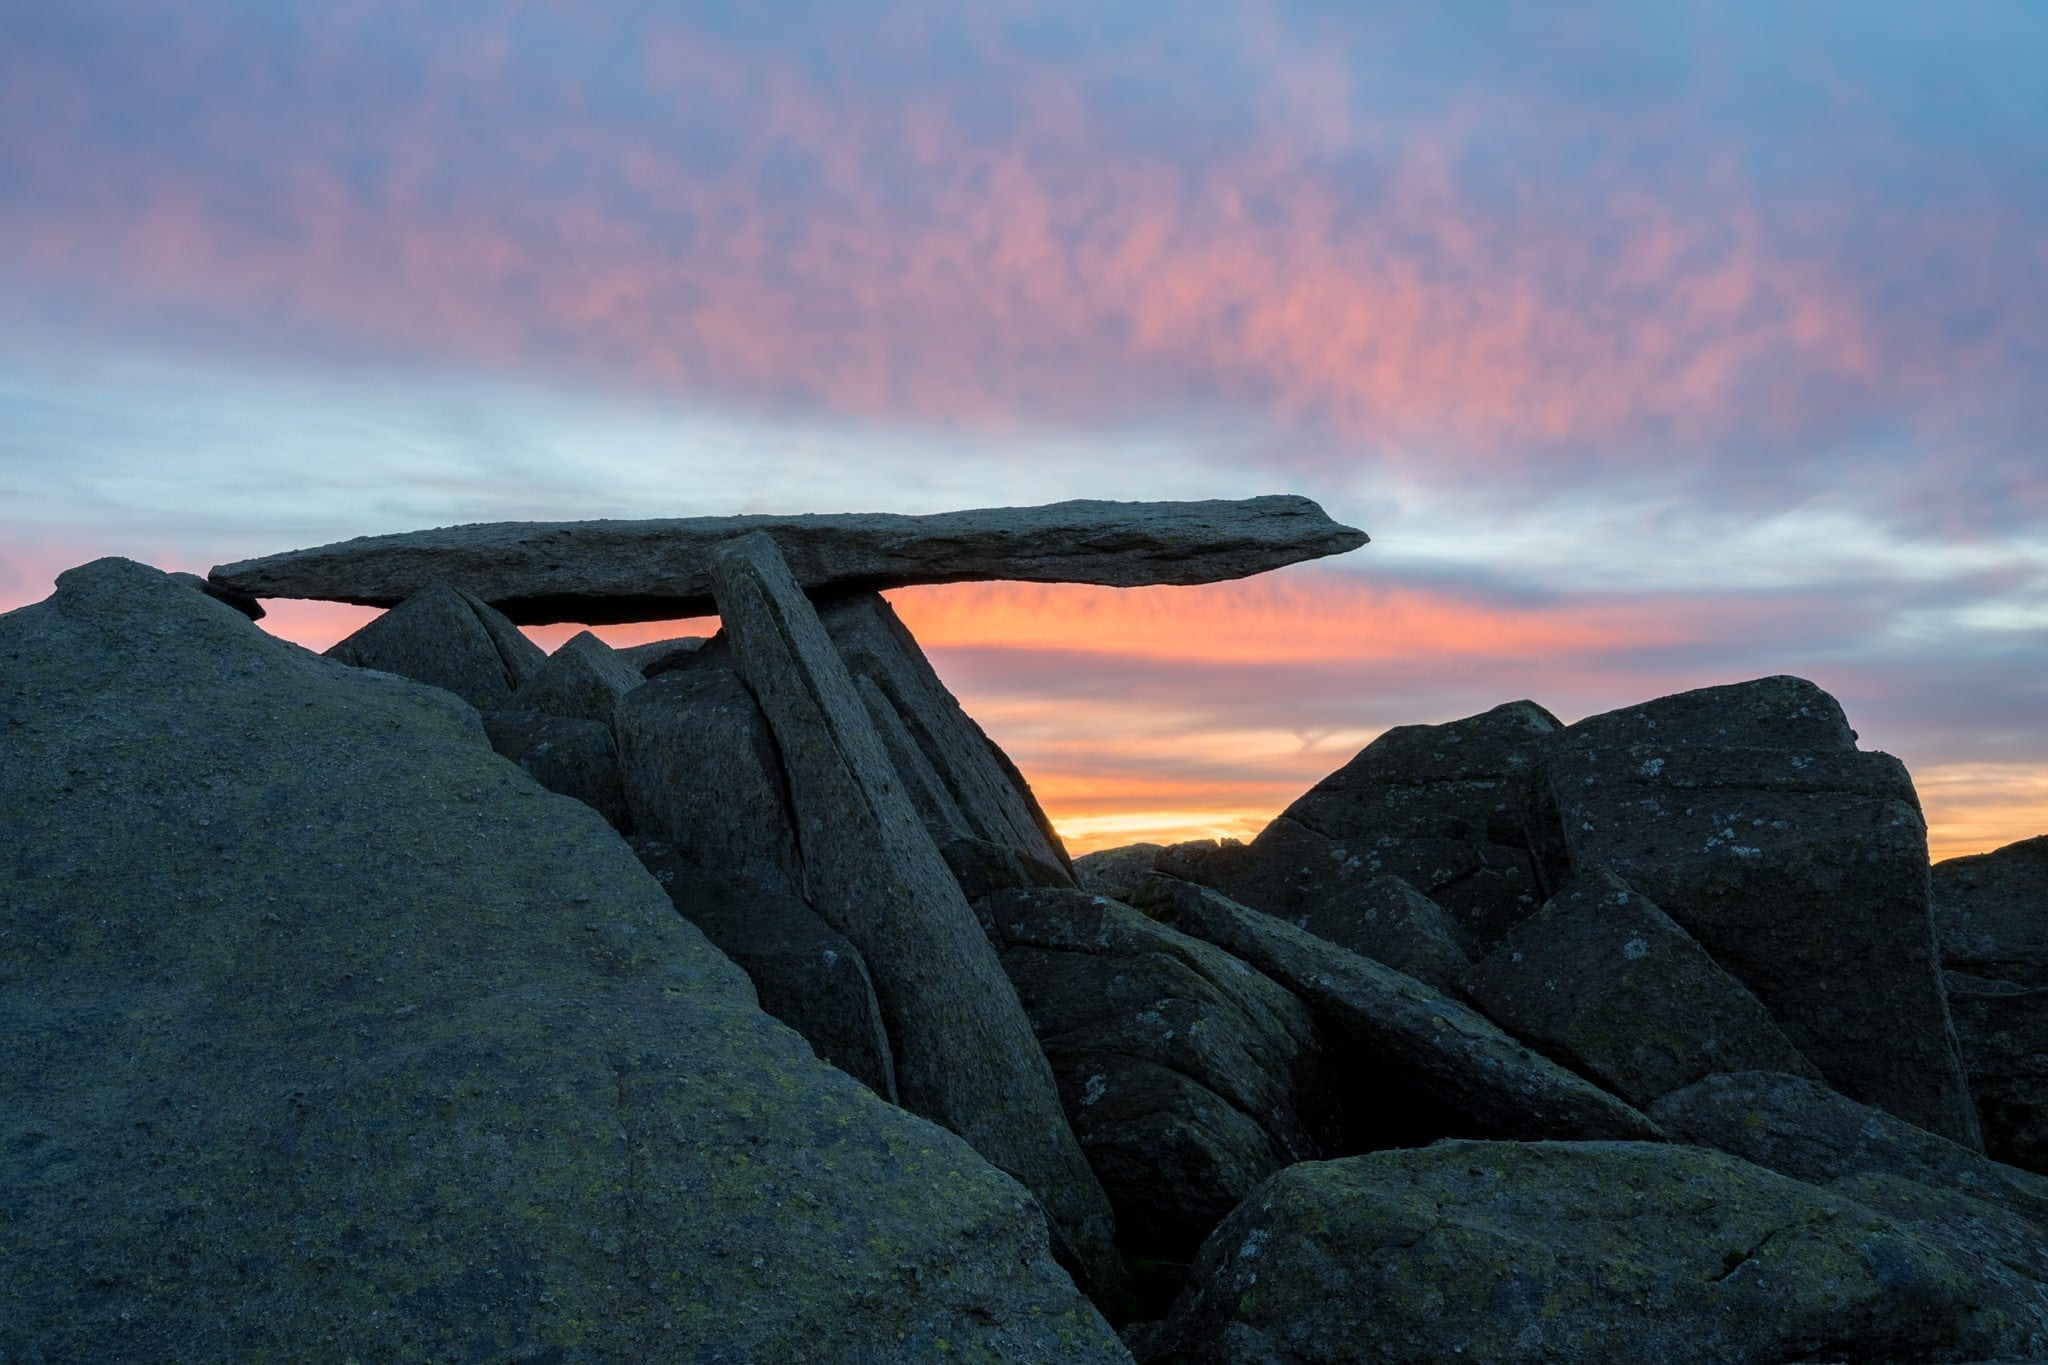 Cantilever Stone Sunrise - Snowdonia Photography